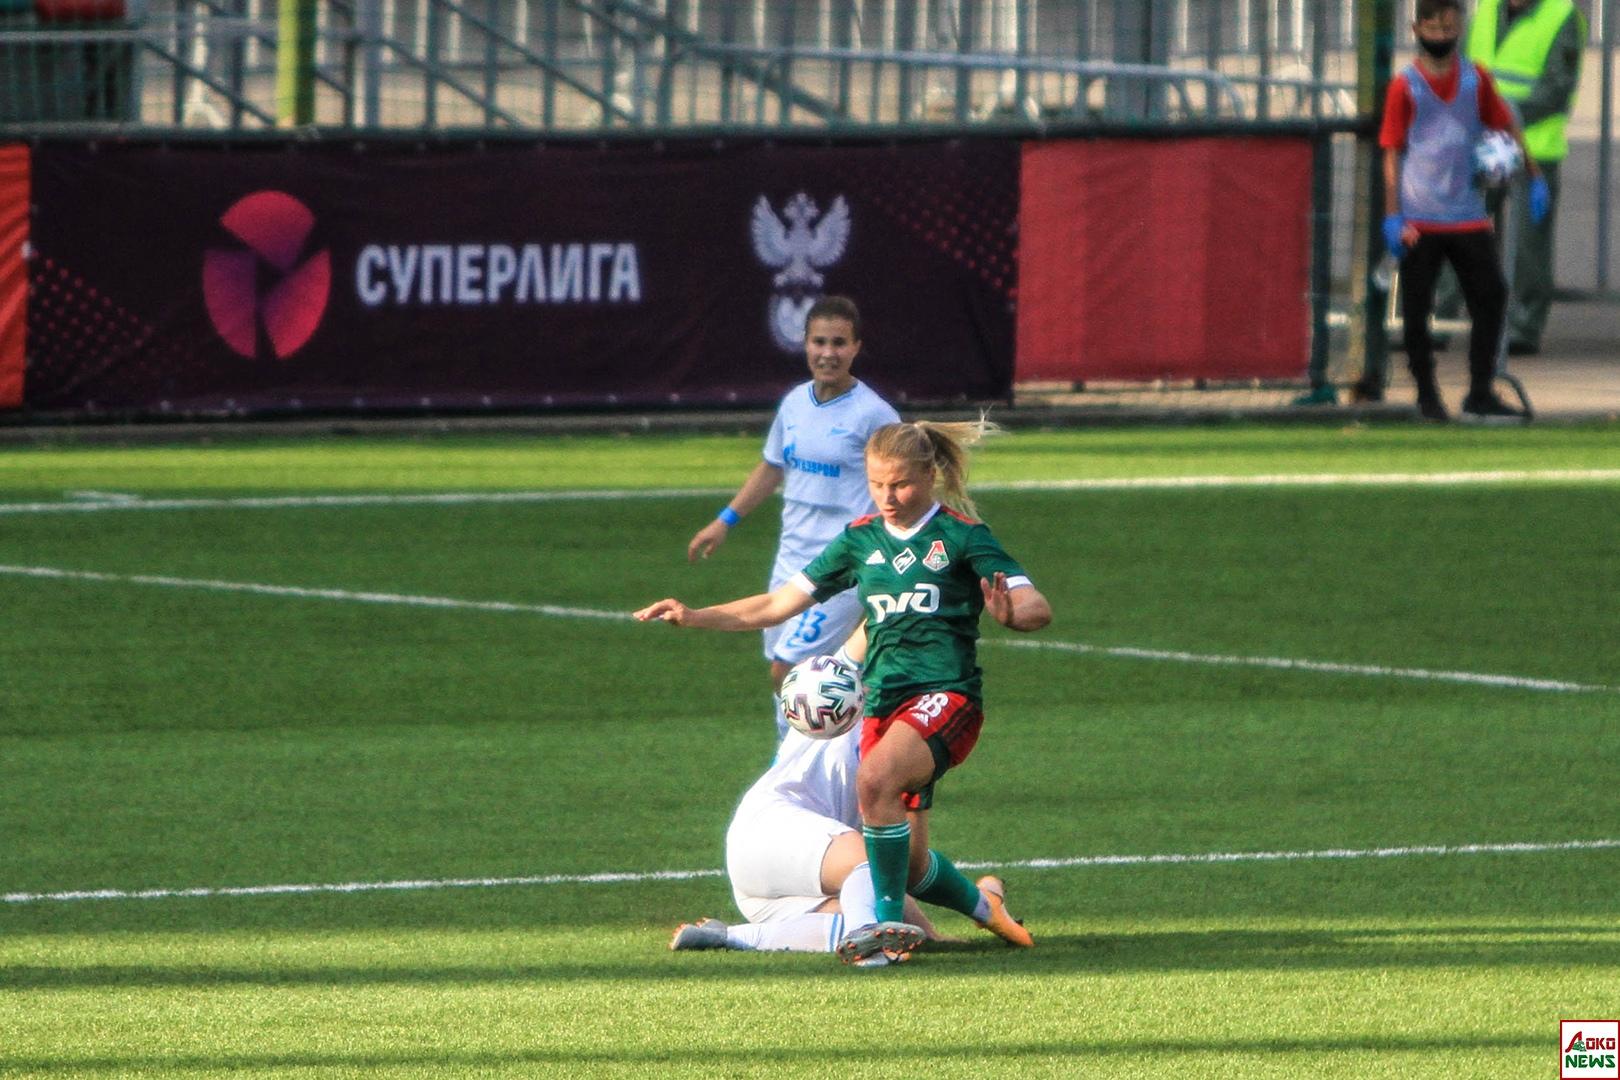 ЖФК Локомотив - ЖФК Зенит. Фото: Дмитрий Бурдонов / Loko.News